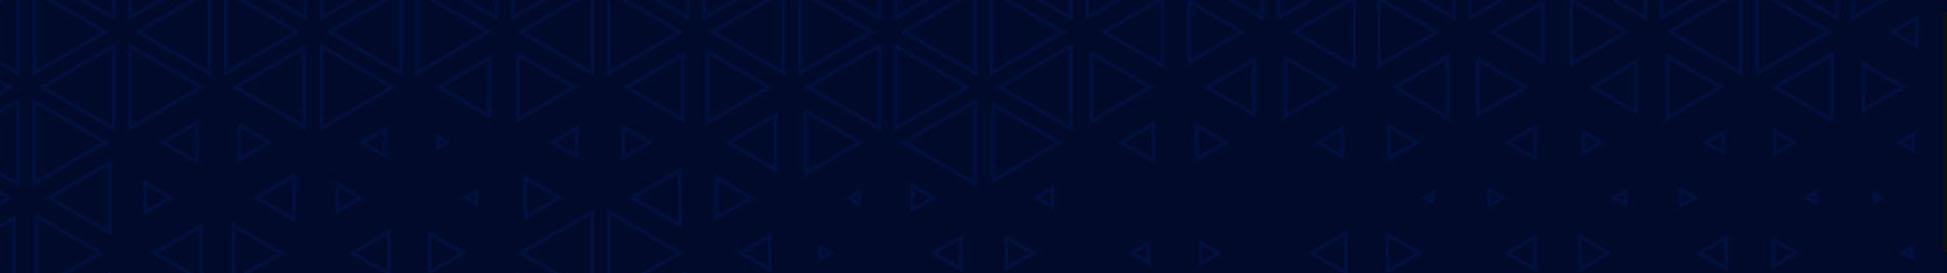 https://thicongepoxyjoton.vn/wp-content/uploads/2020/08/bannner1.jpg